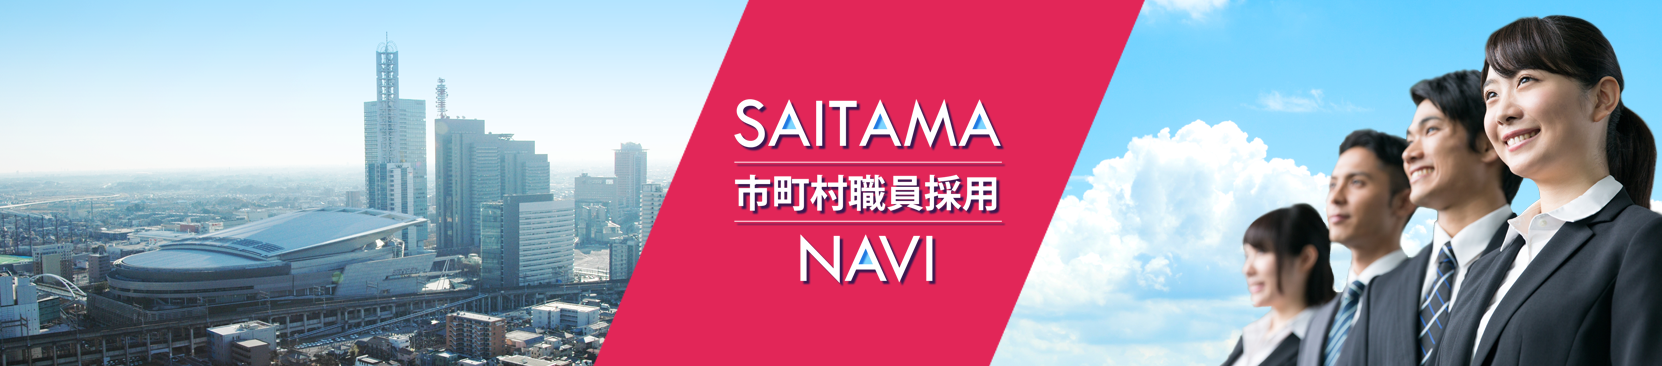 SAITAMA 市町村職員採用 NAVI